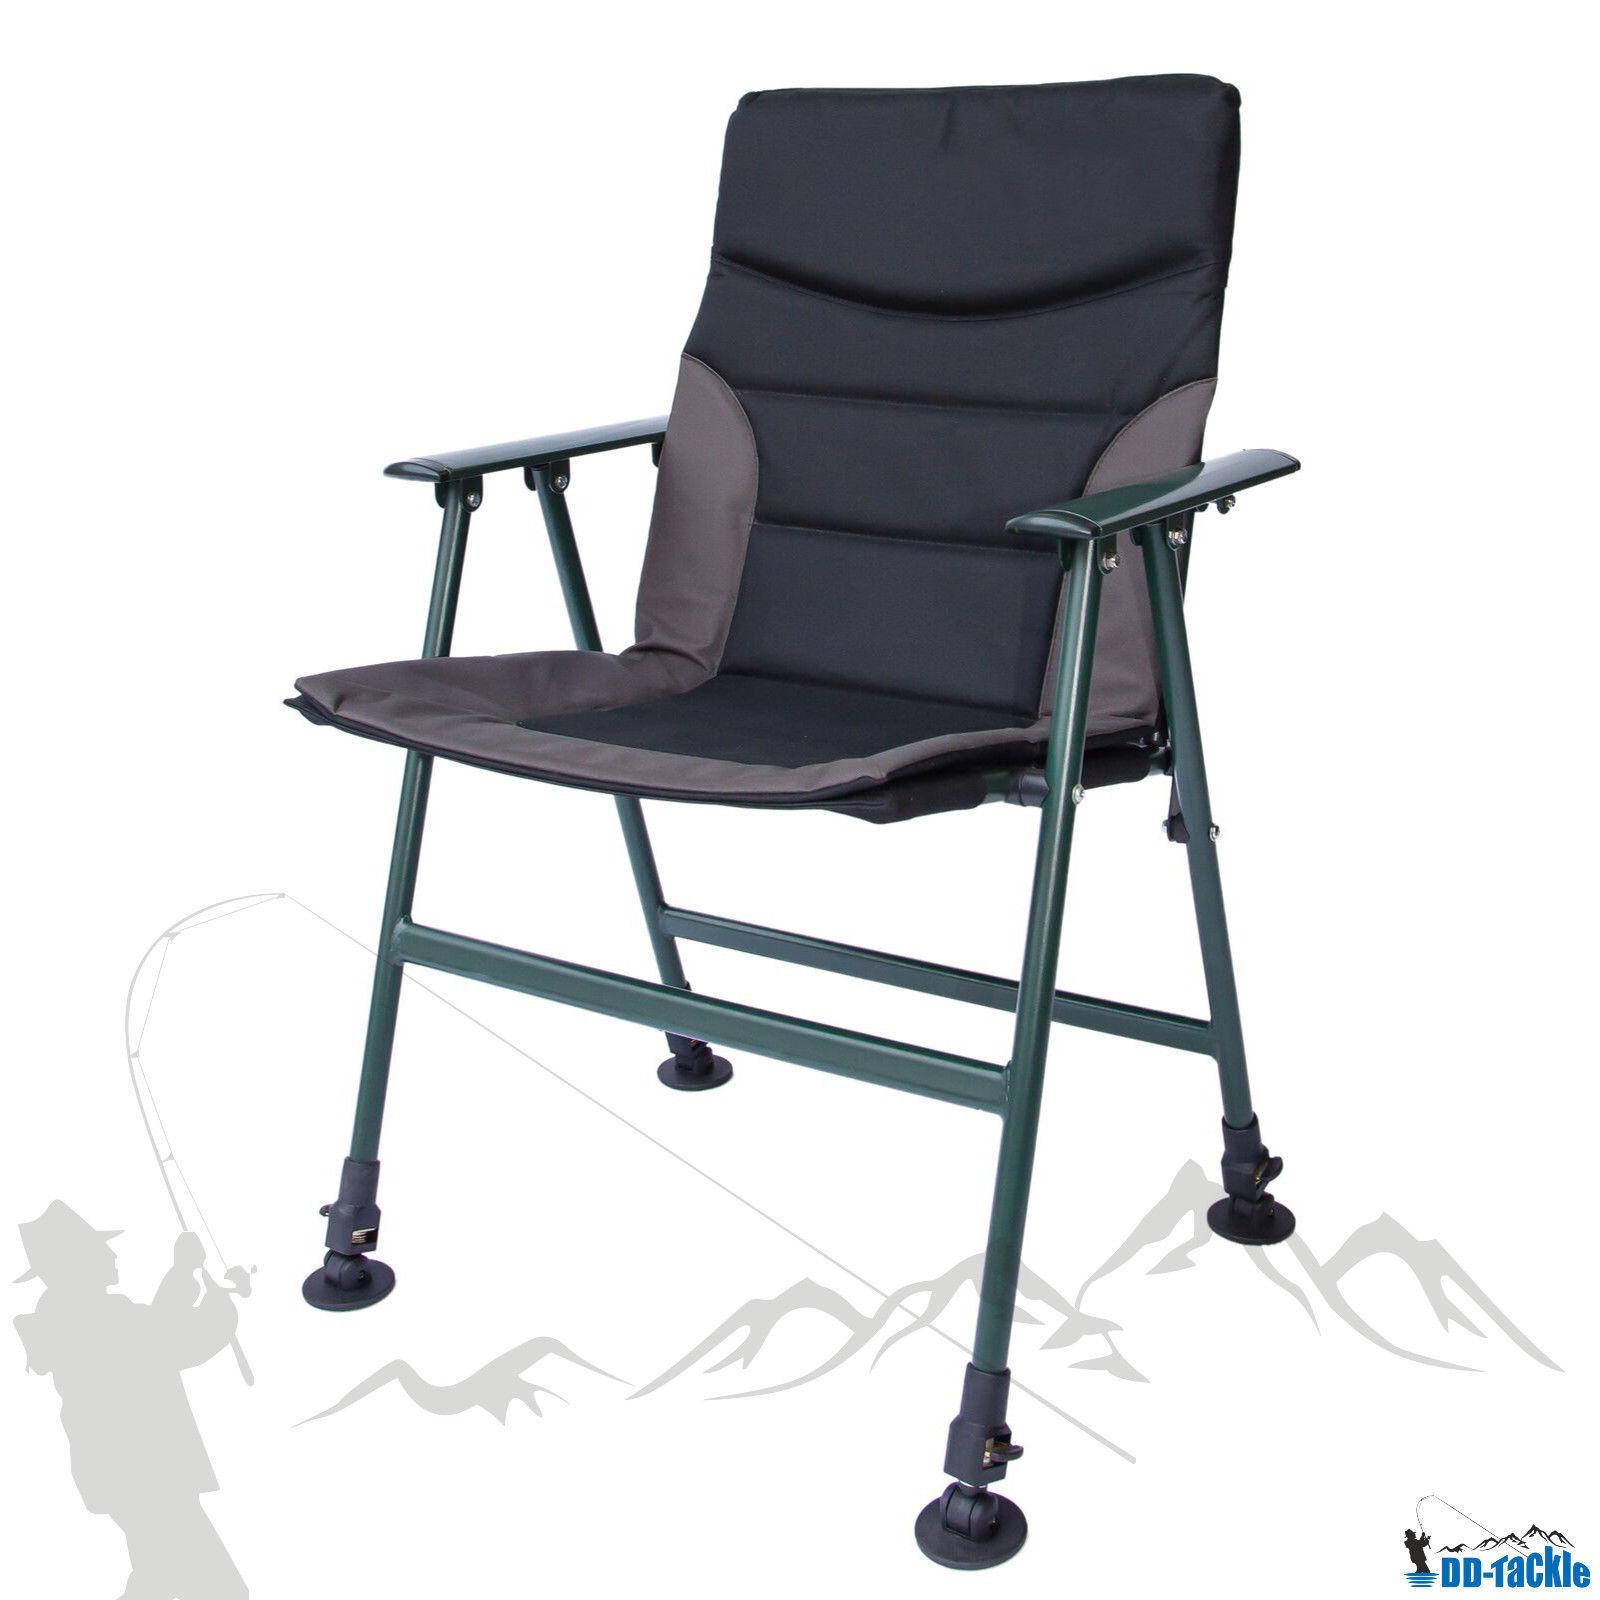 NUOVO Relax XL CARP Chair LUSSO carpa sedia BRACCIOLI Angel sedia Sedia Carpa